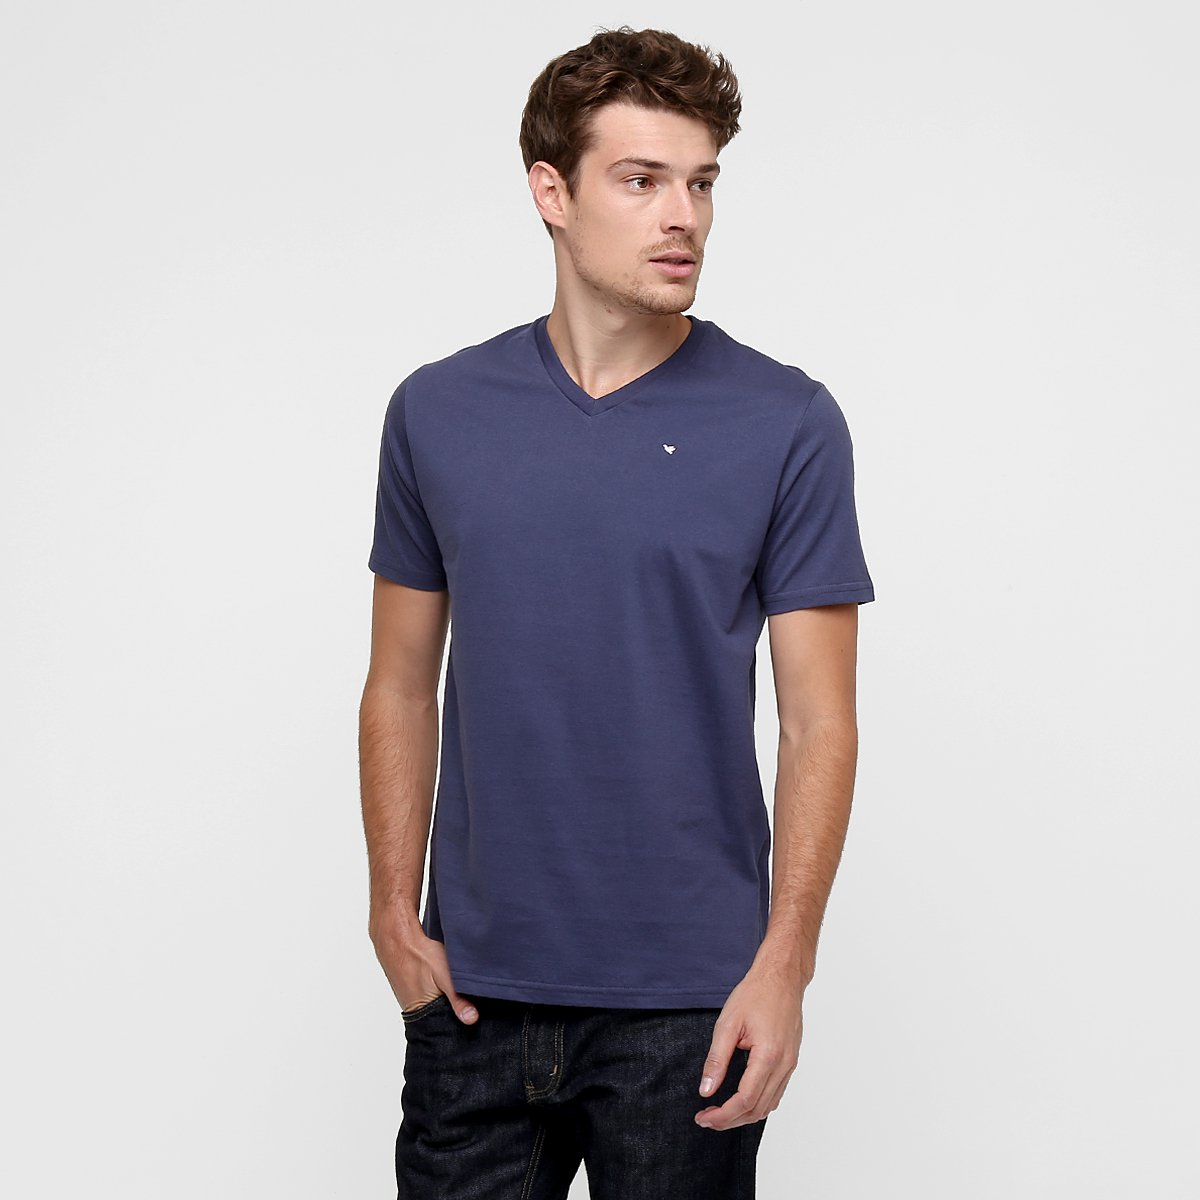 b8707d26d6 Camiseta Polo Concept Gola V Básica - Compre Agora